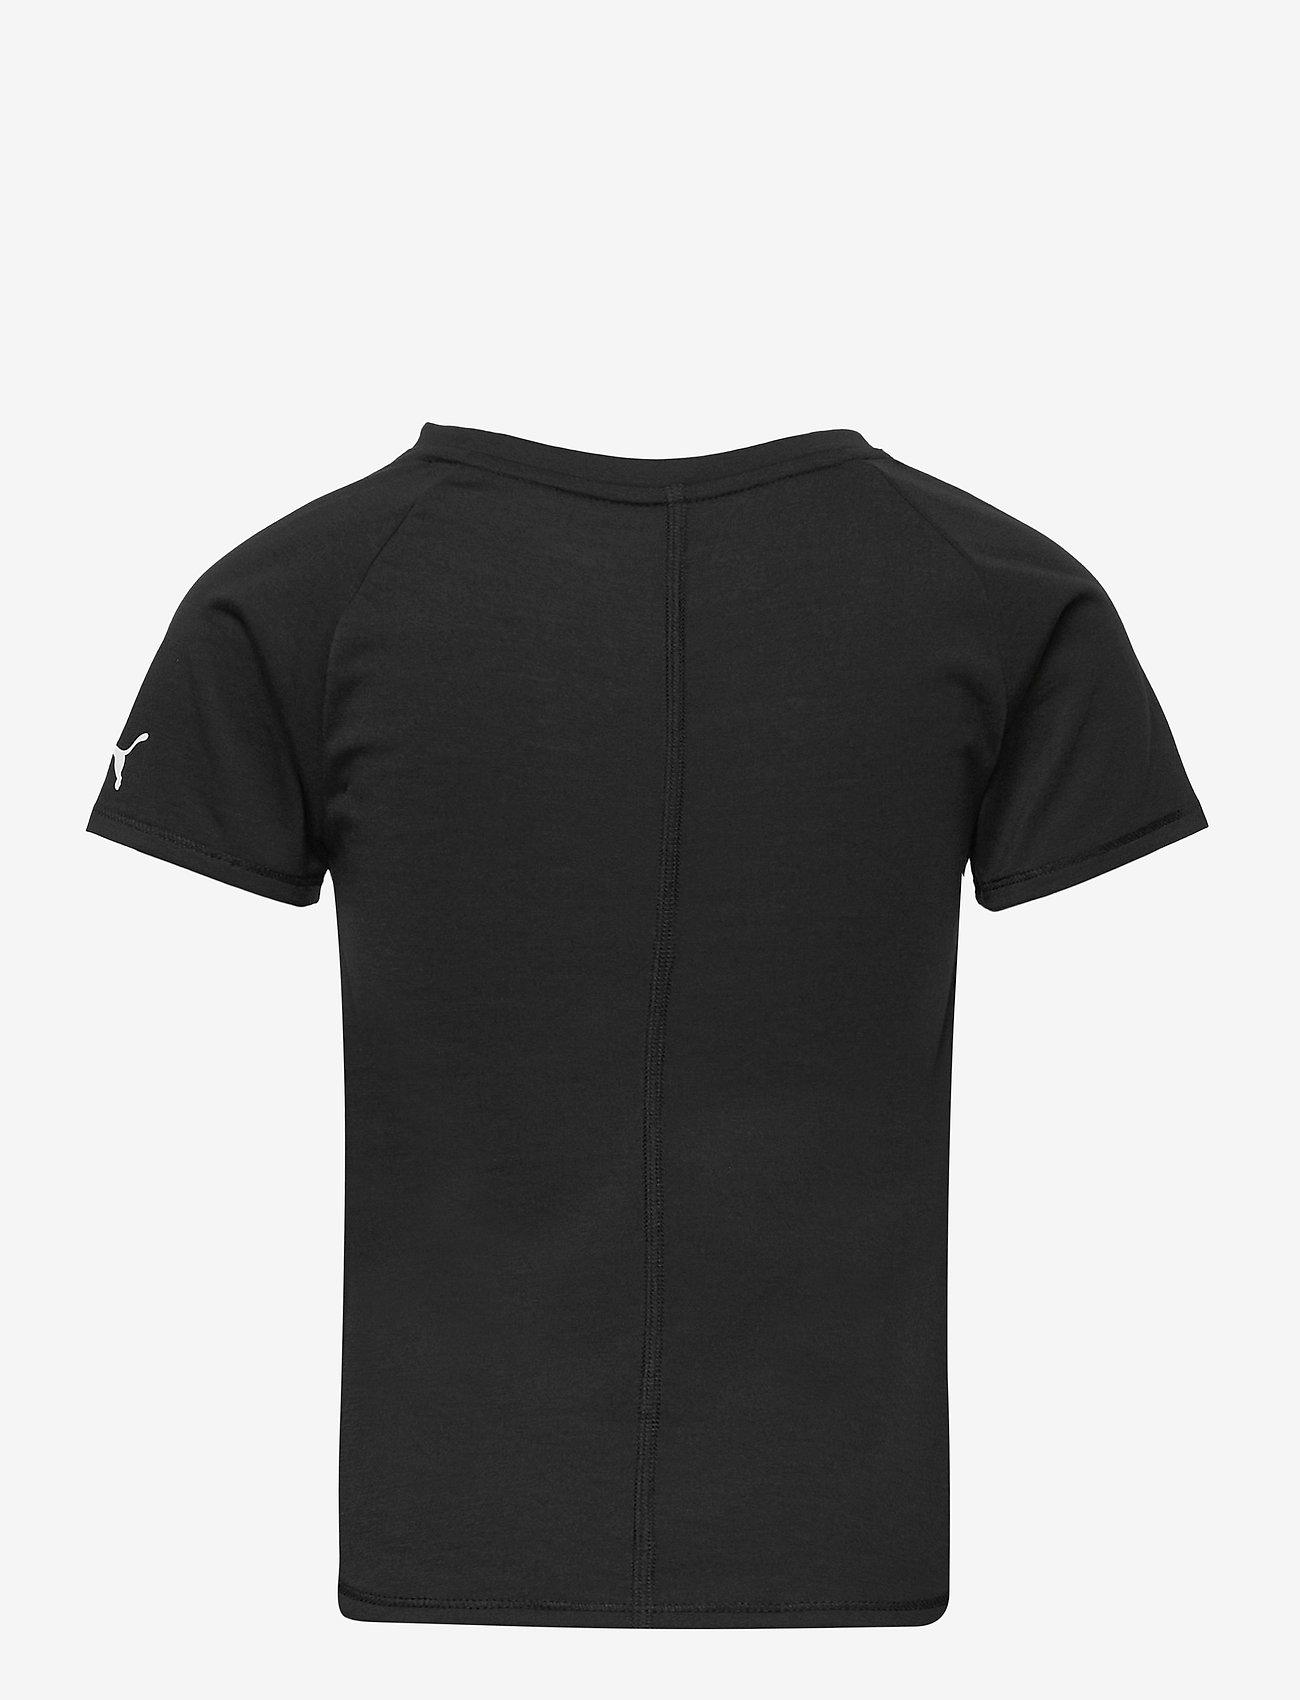 PUMA - Runtrain Tee G - kortärmade t-shirts - puma black - 1